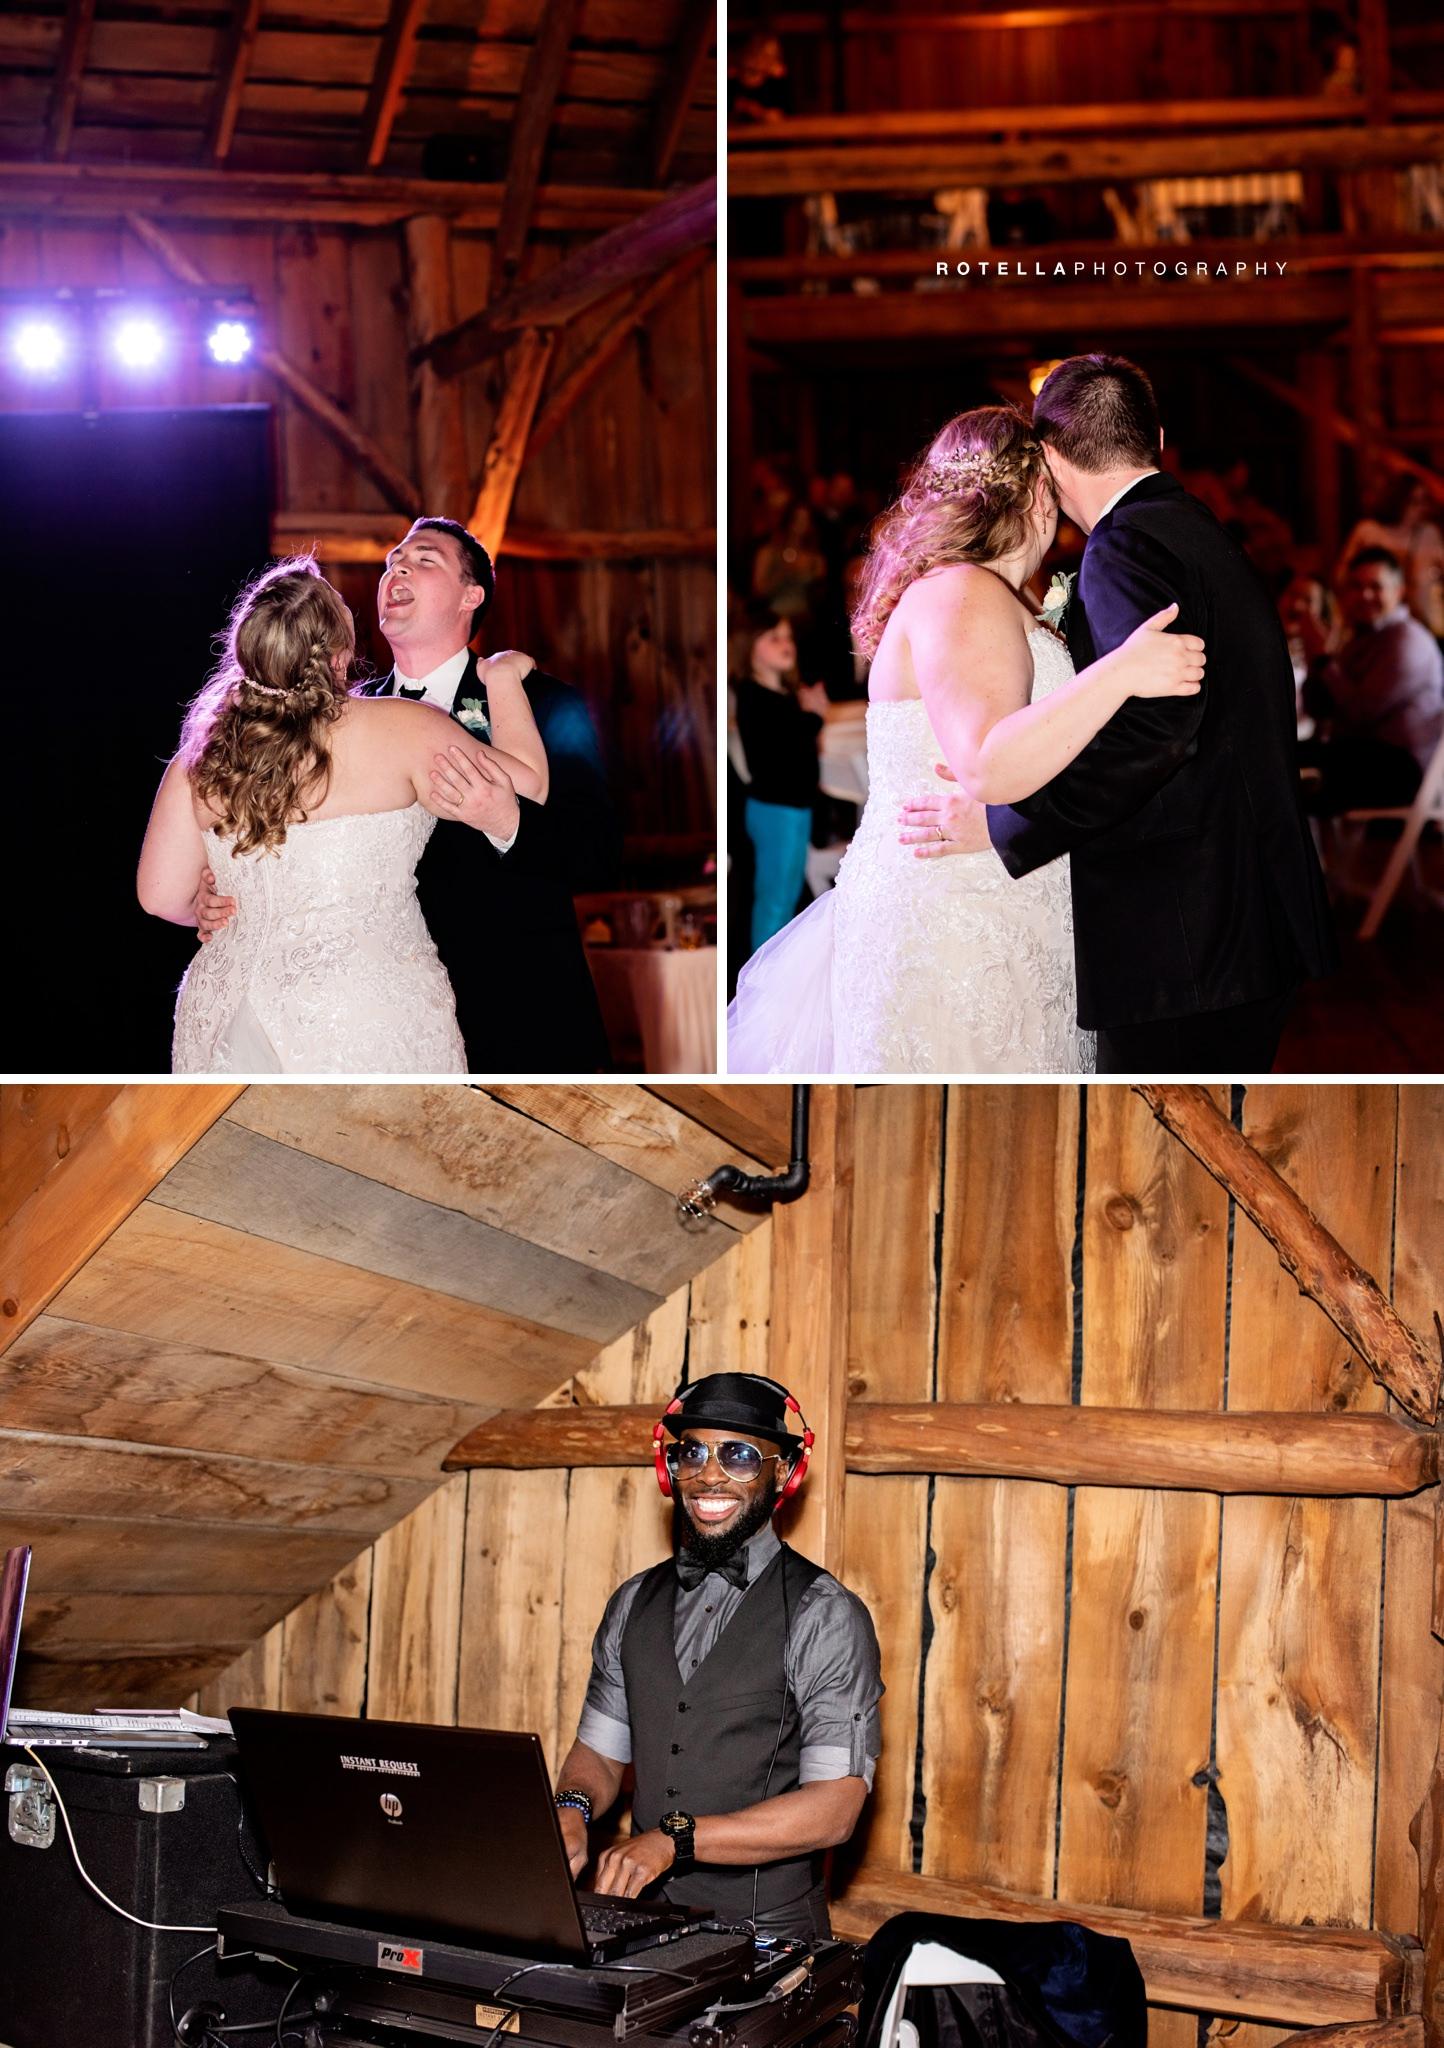 Cassie-Corbin-Wedding-05-25-2019-Rotella-Photography-PREV-97-926_BLOG.jpg